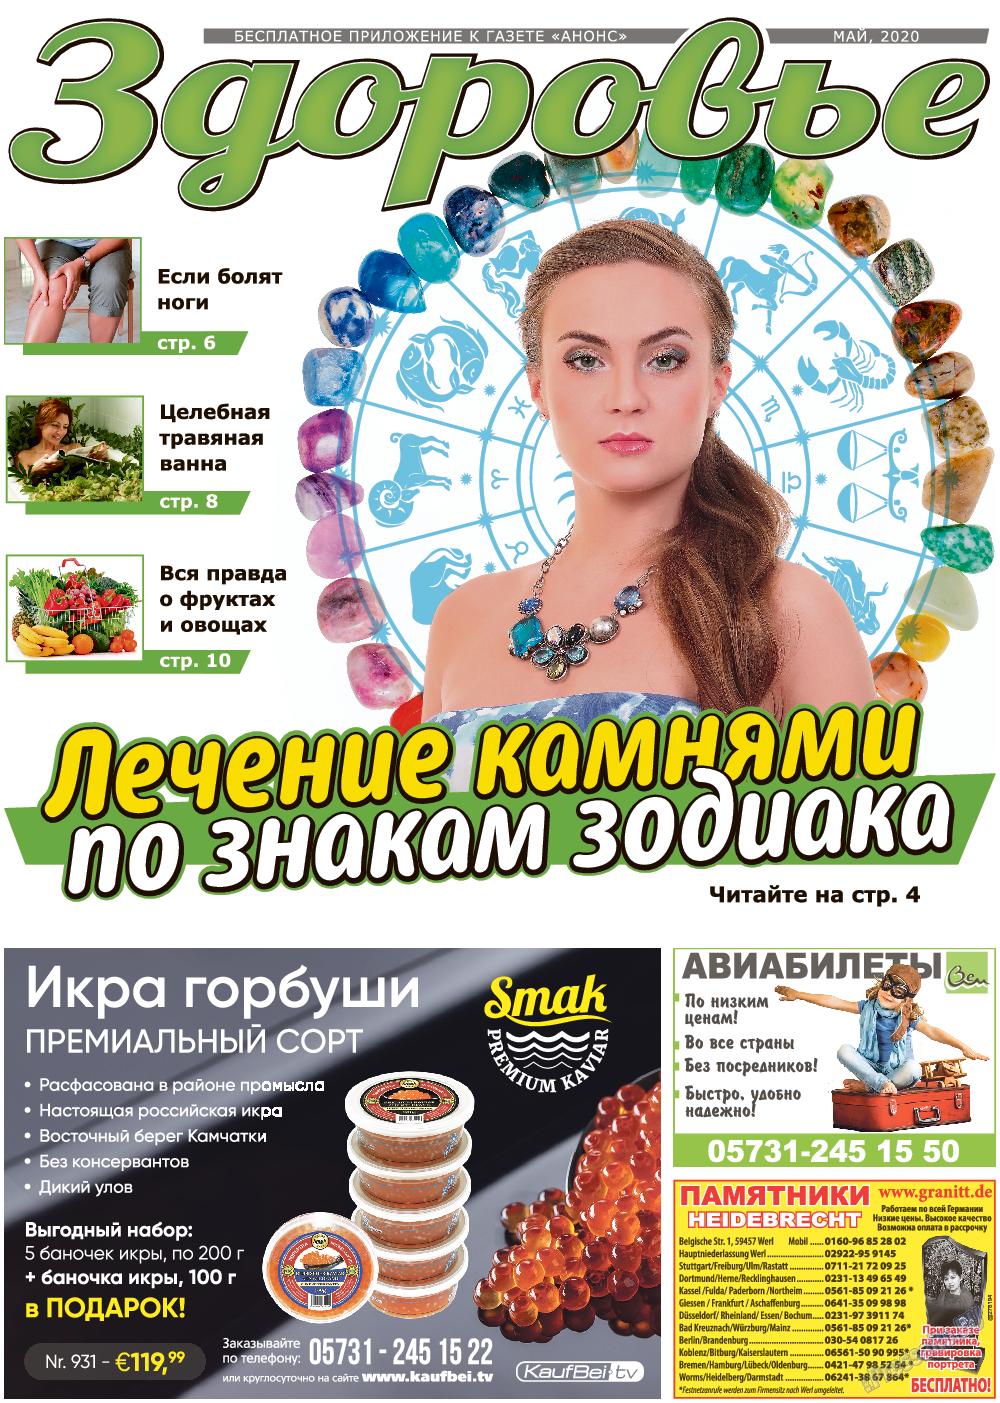 Здоровье (газета). 2020 год, номер 5, стр. 1